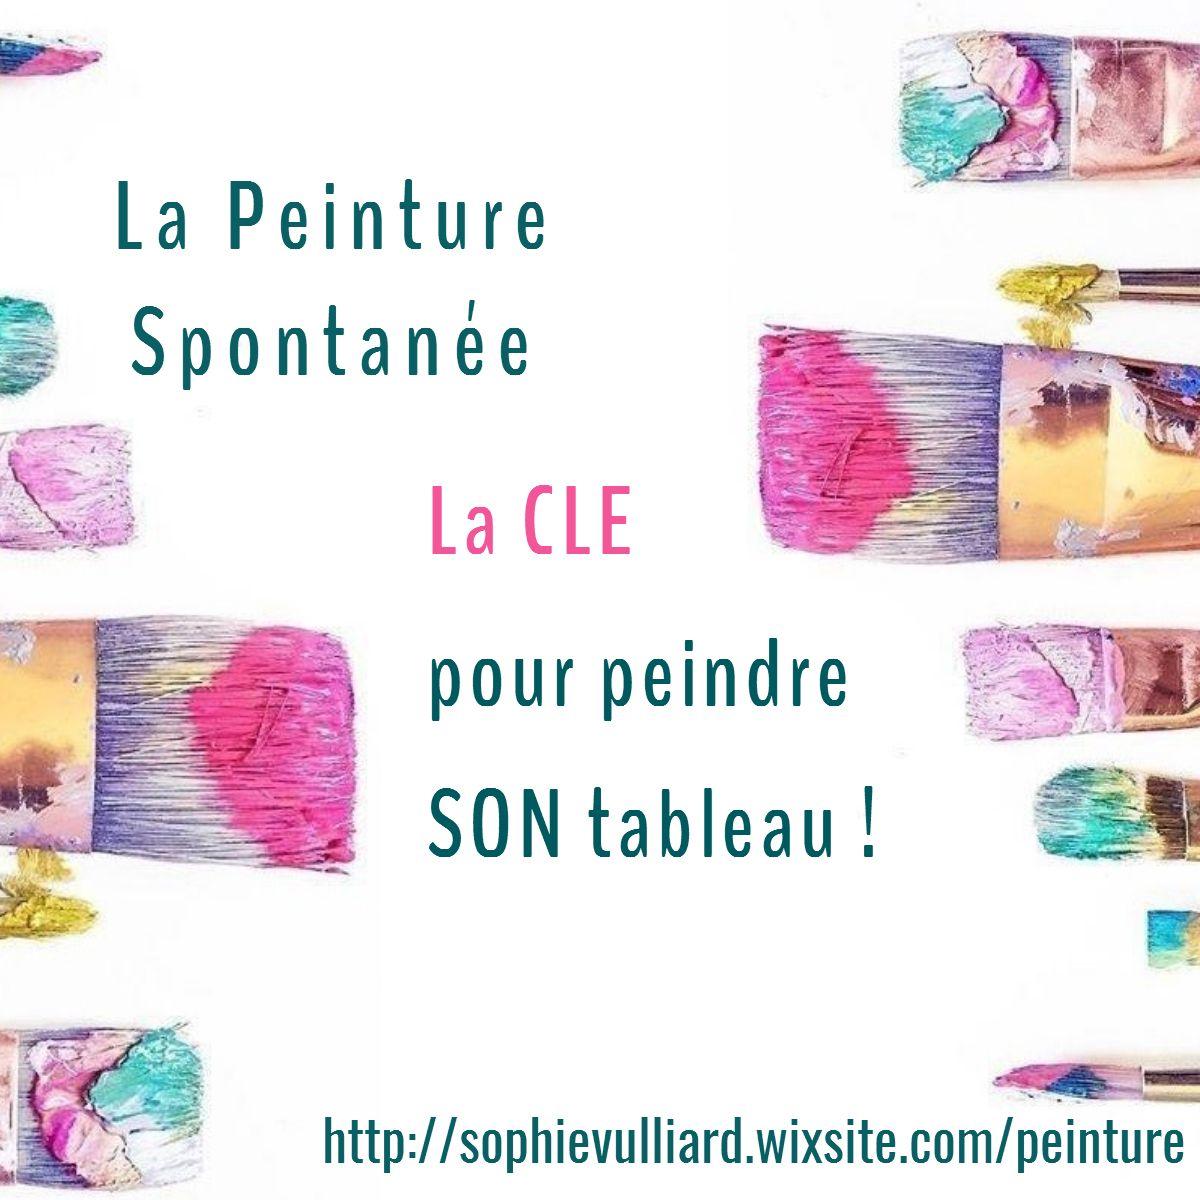 Article Peinture Spontanee Creer Son Tableau Peindre Un Tableau